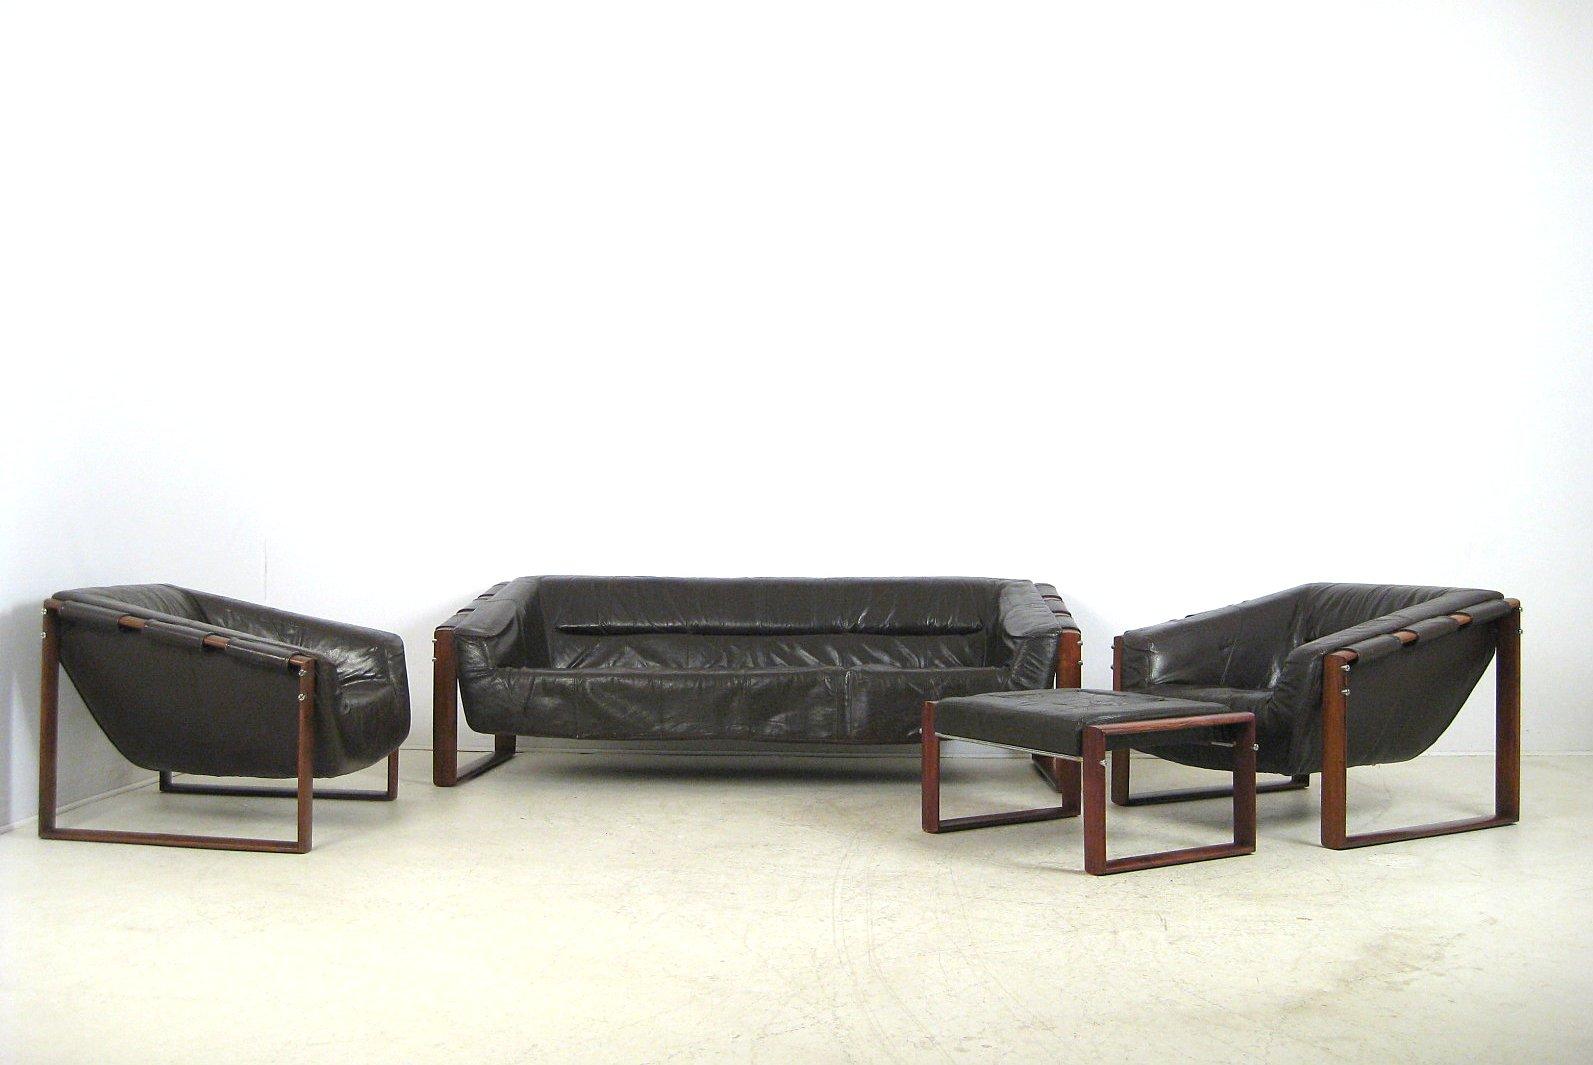 Uberlegen Good Percival Lafer Lounge Suite Der Er Jahre Sofa Paar Sessel Ottomane Fr  Lafer Furniture Sao Paulo With Sessel Mit Ottomane